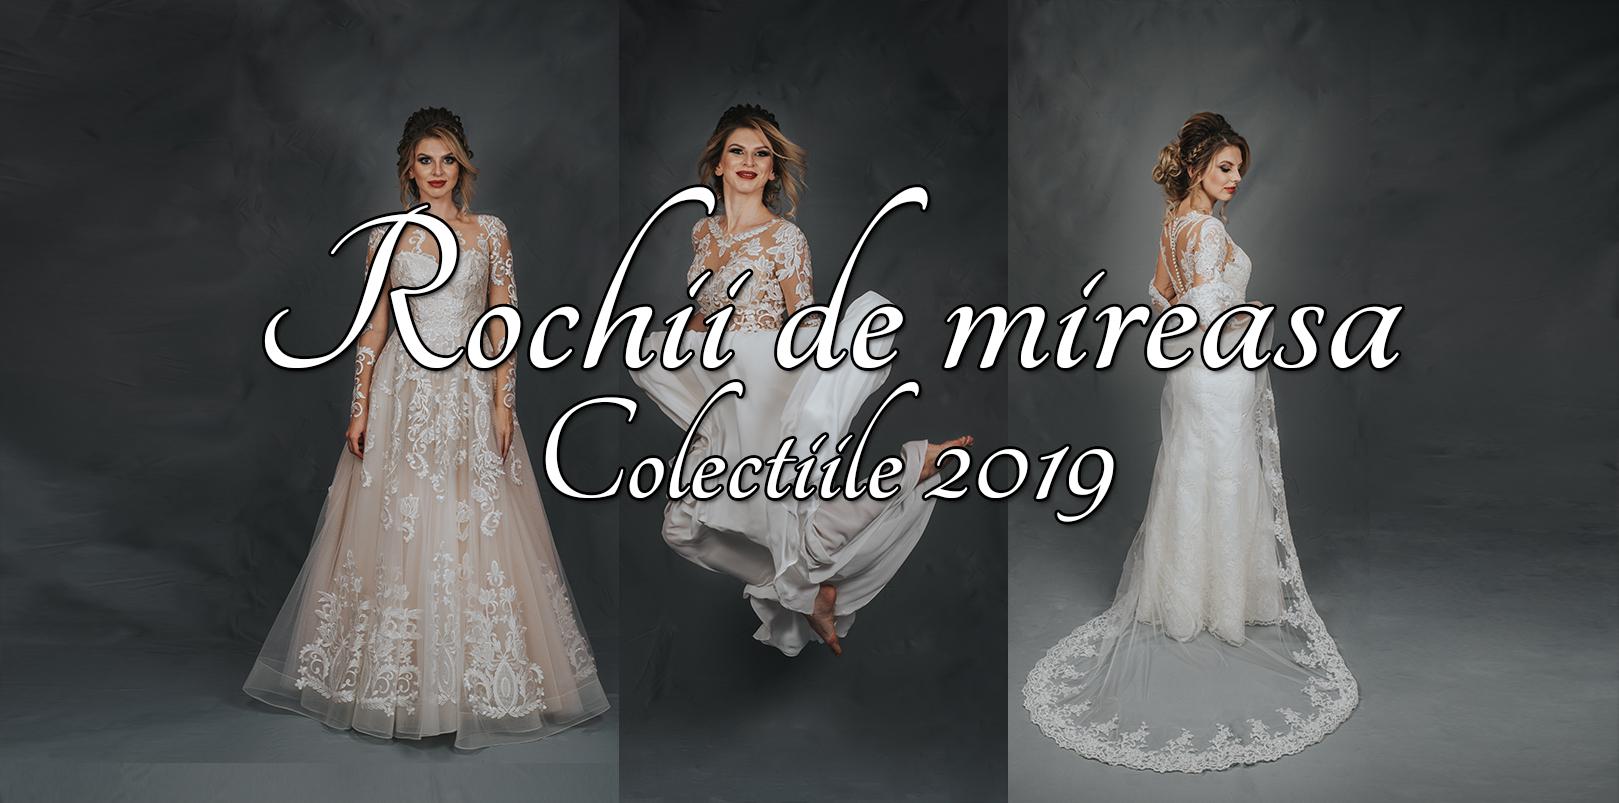 Ludmila Atelier Piatra Neamt Rochii De Mireasa Rochii De Ocazie